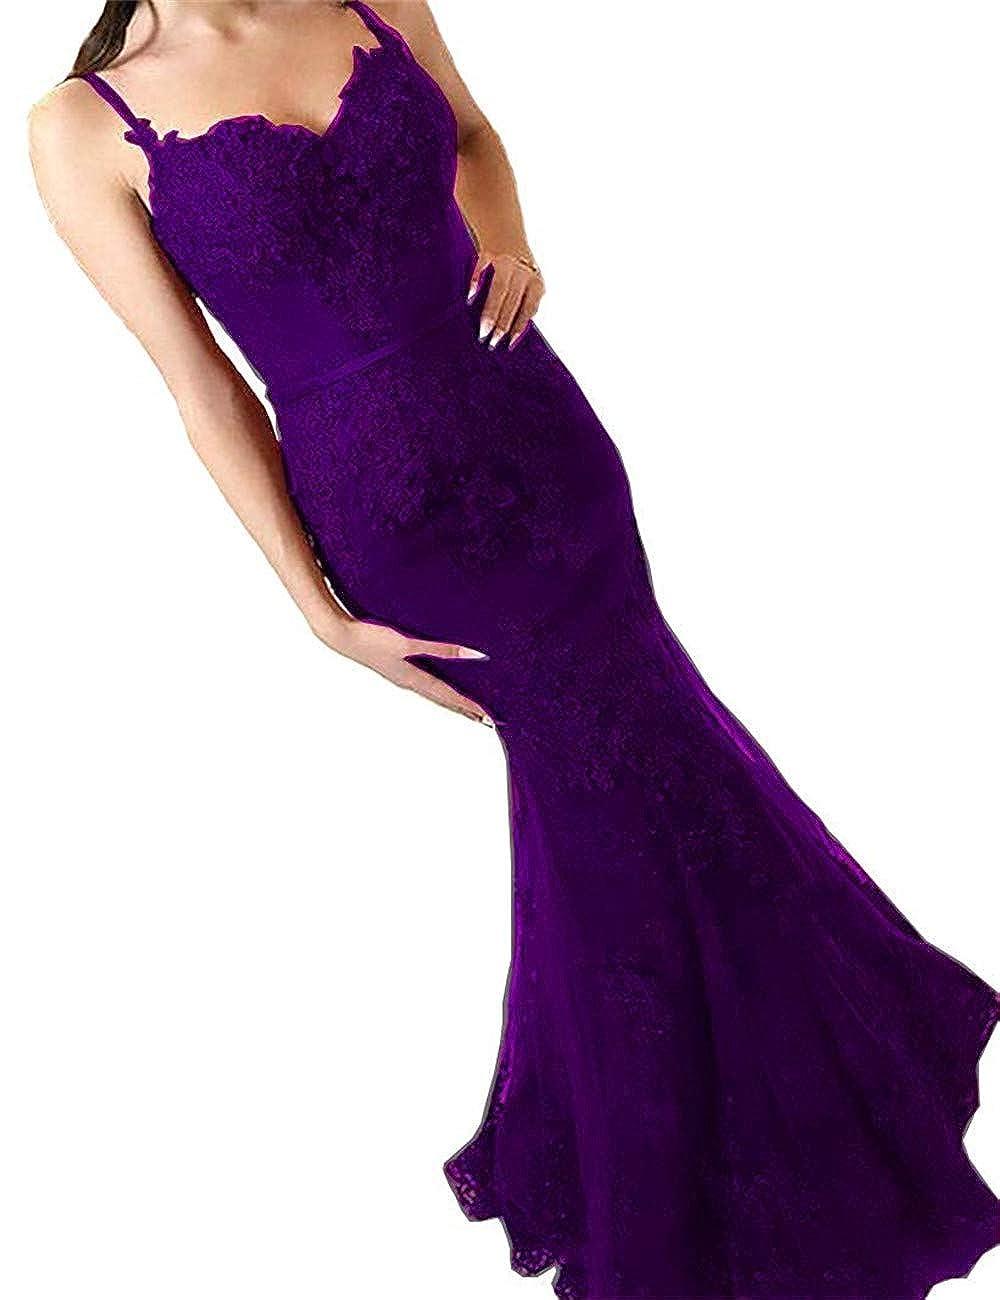 Dark Purple Sophie Women's Mermaid Full Lace Prom Dresses Spaghetti Straps Long Formal Evening Dress S164